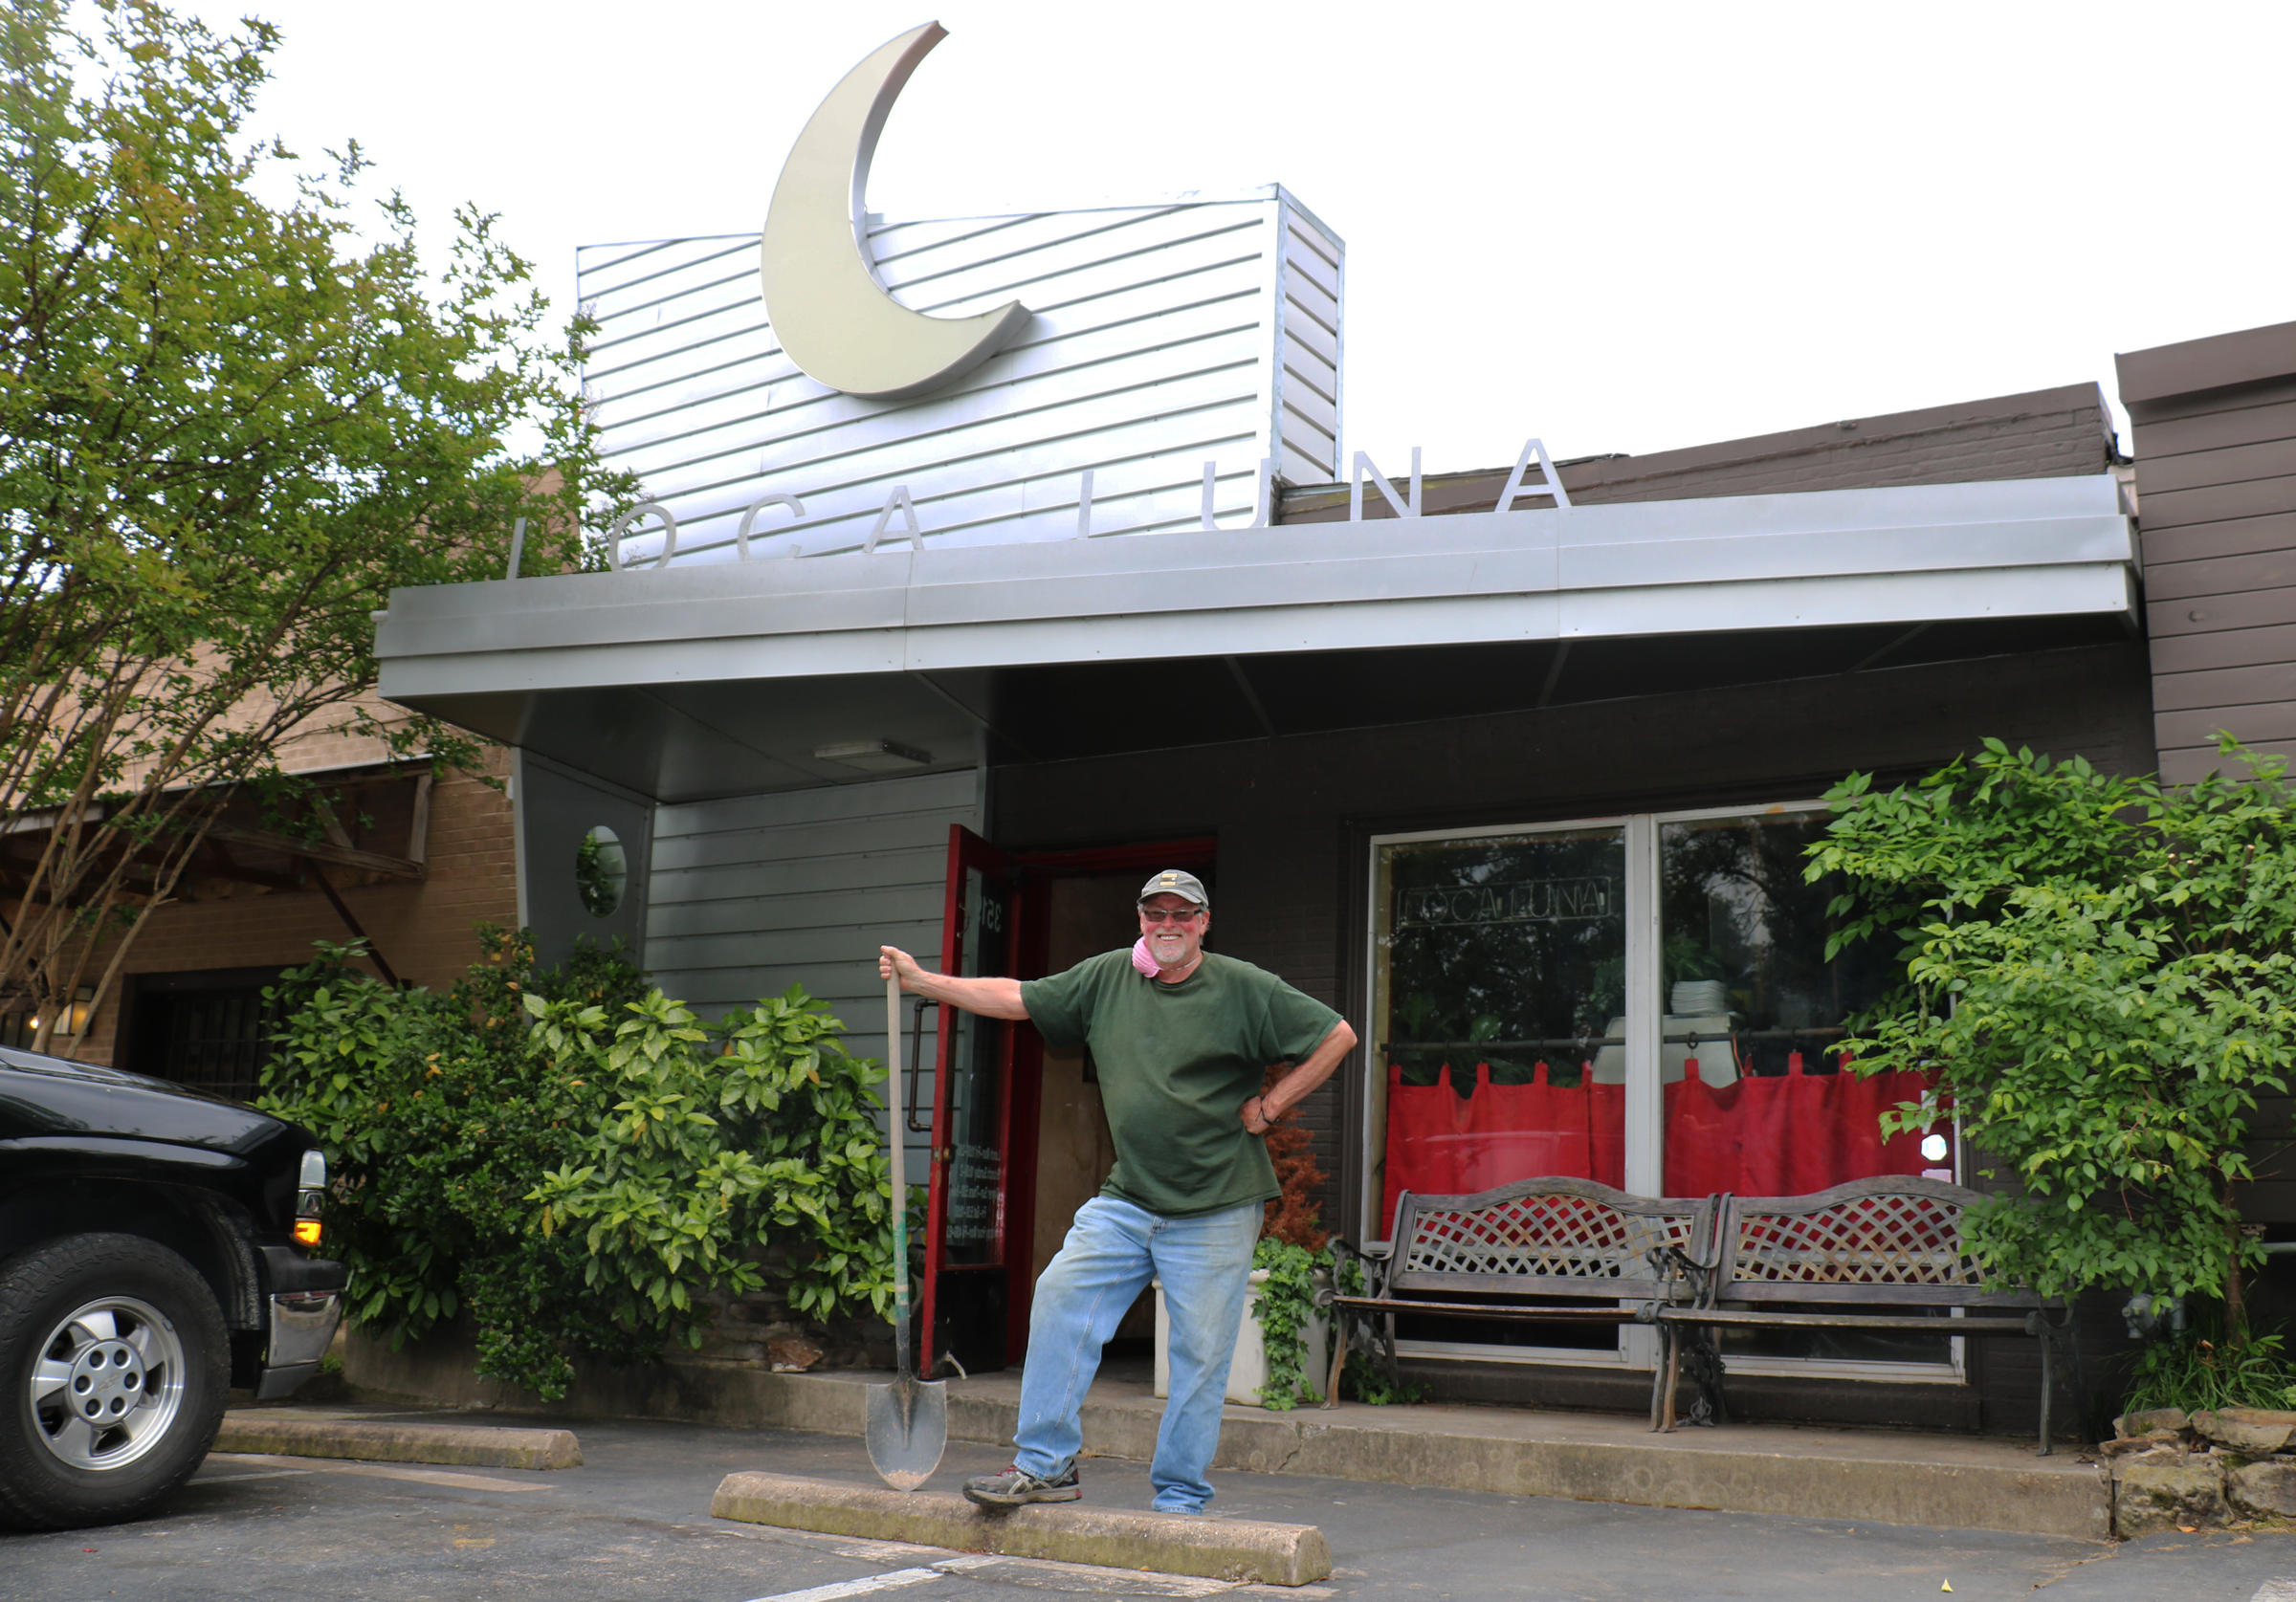 Restaurants Open On Christmas Little Rock Arkansas 2020 Many Arkansas Restaurants Opting To Remain Closed Despite Lift In